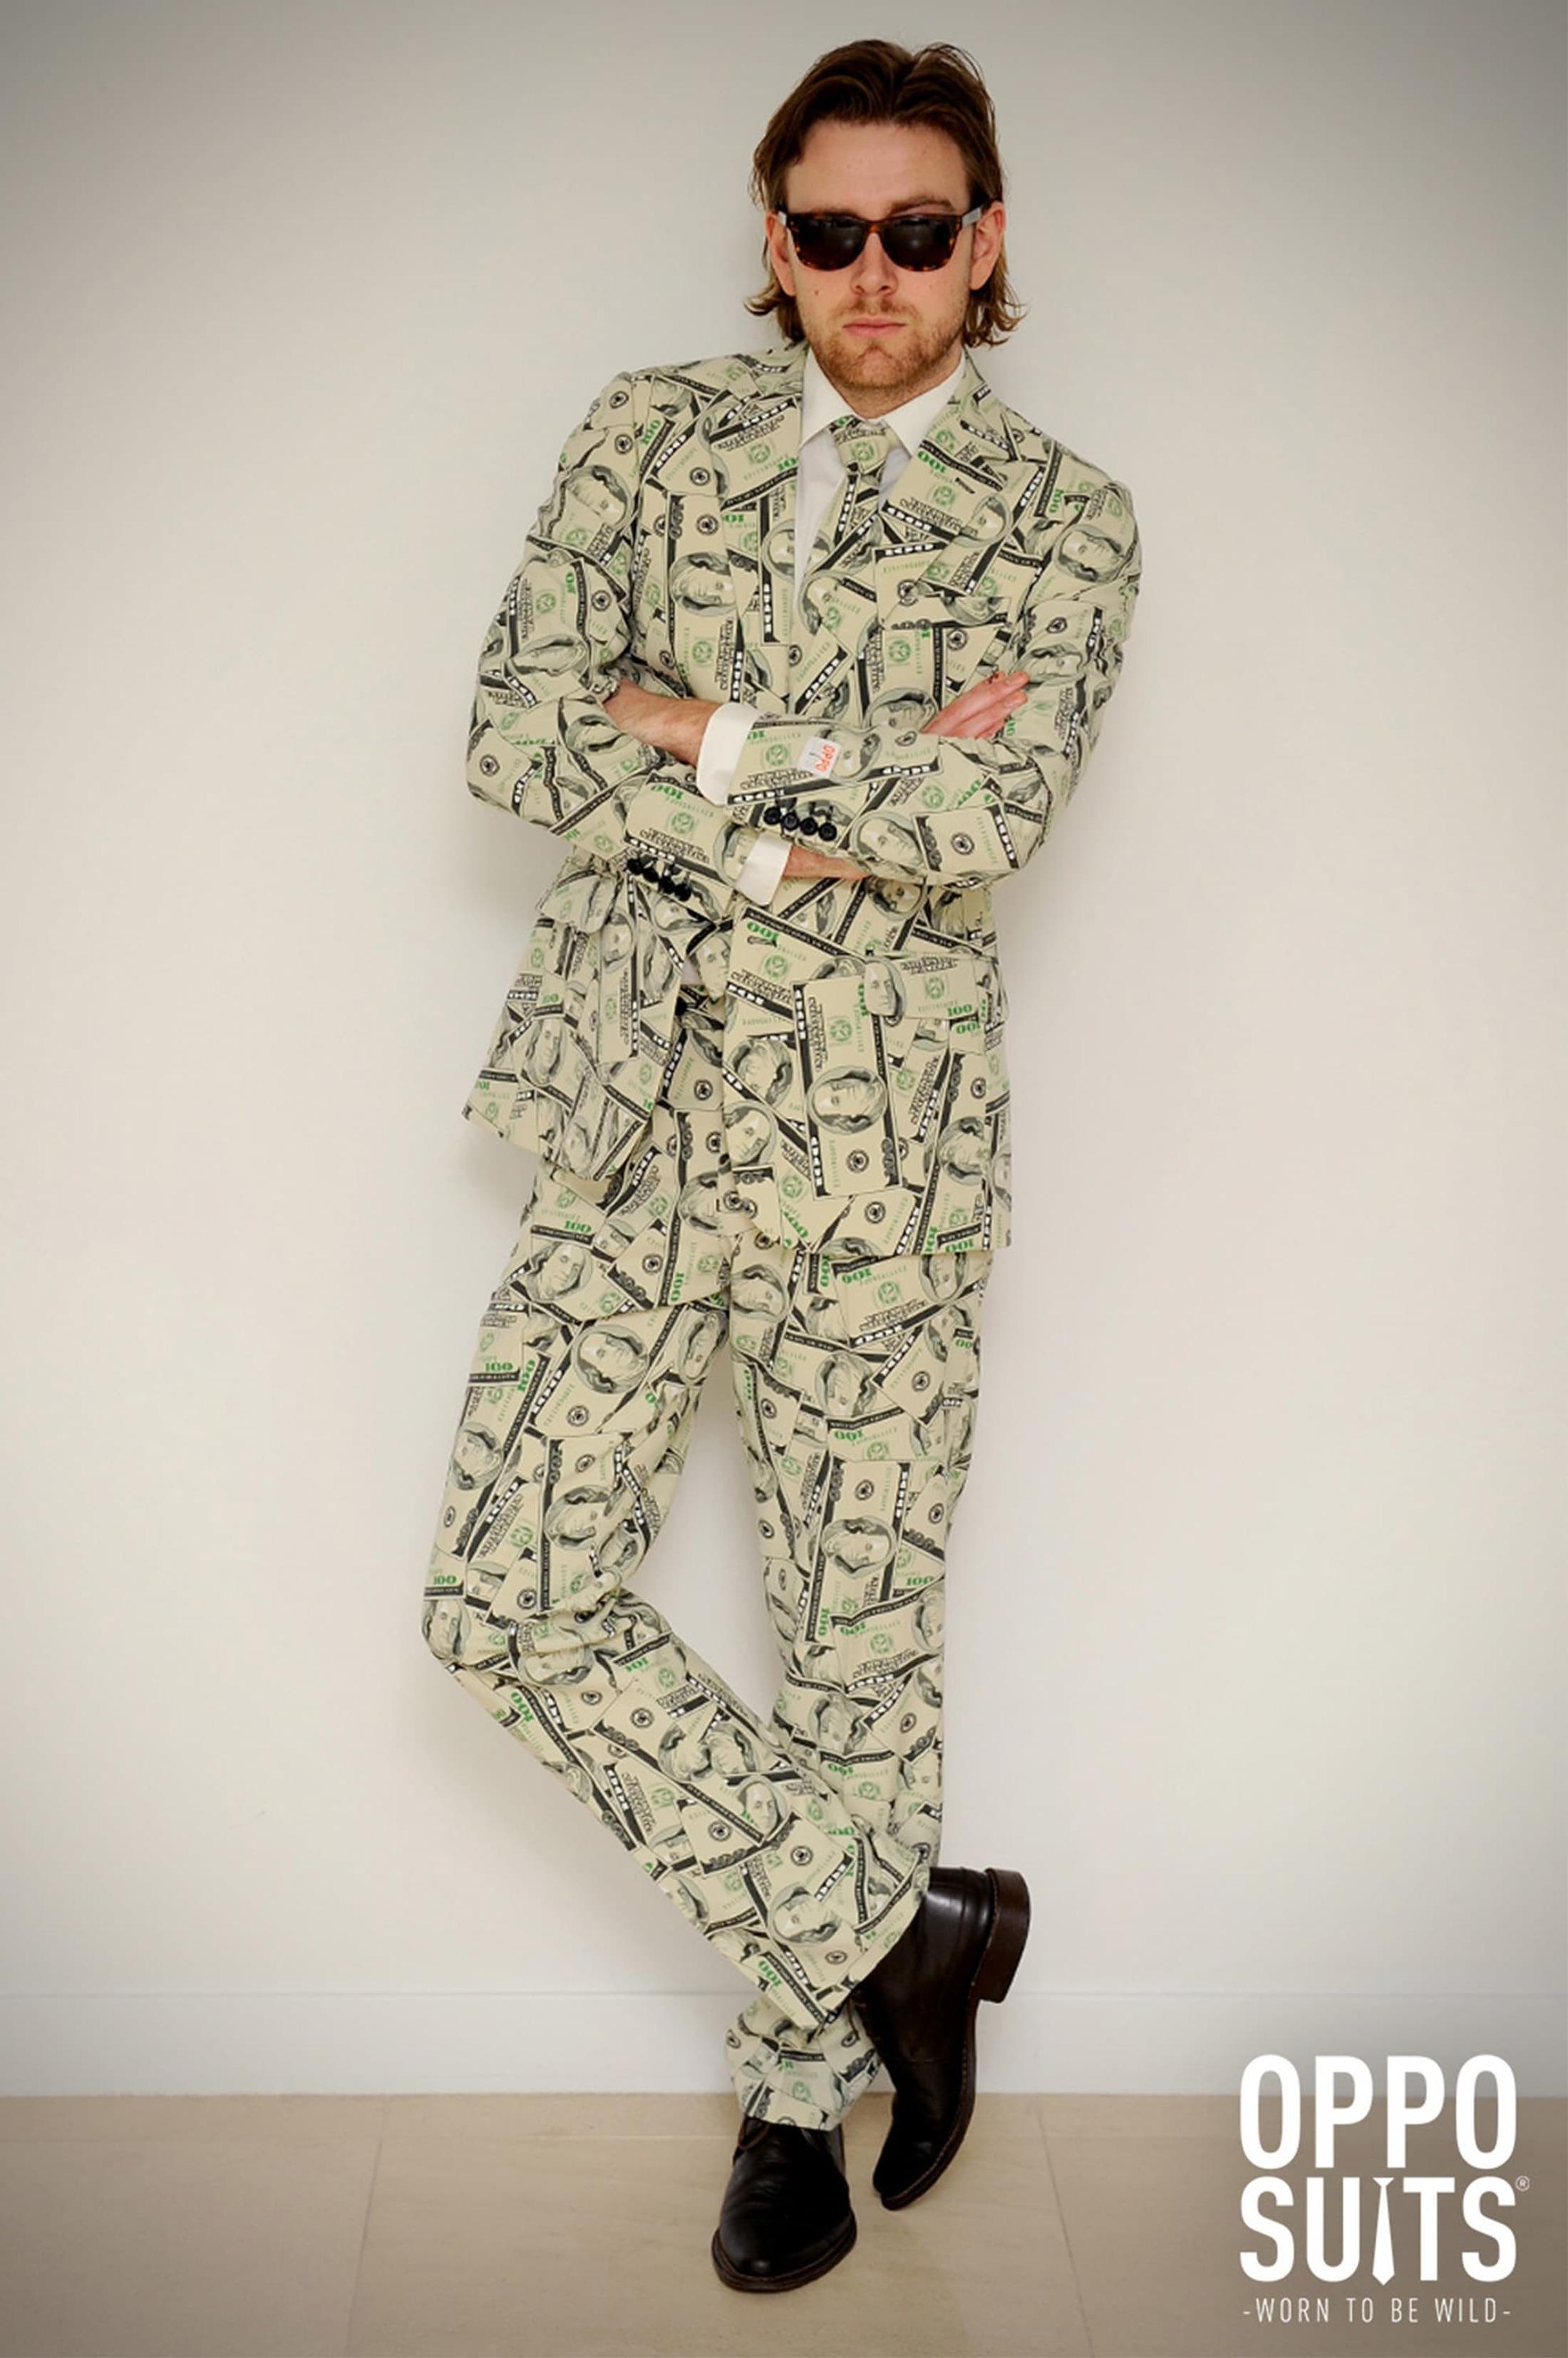 OppoSuits Cashanova Kostuum foto 2